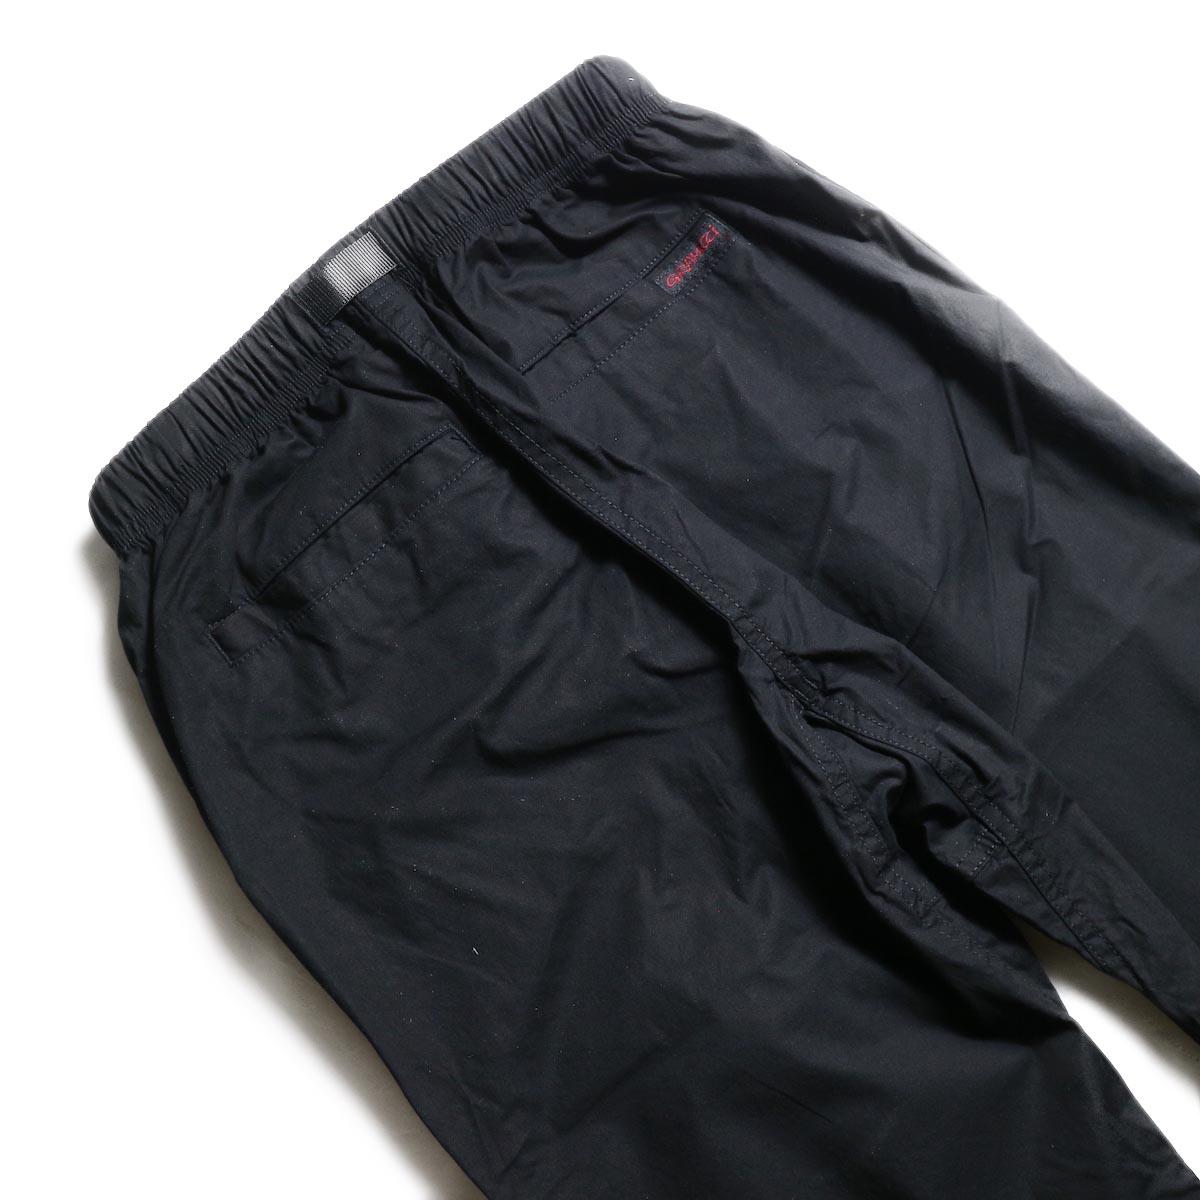 GRAMICCI / Weather NN-Pants Just Cut (Black) ヒップポケット